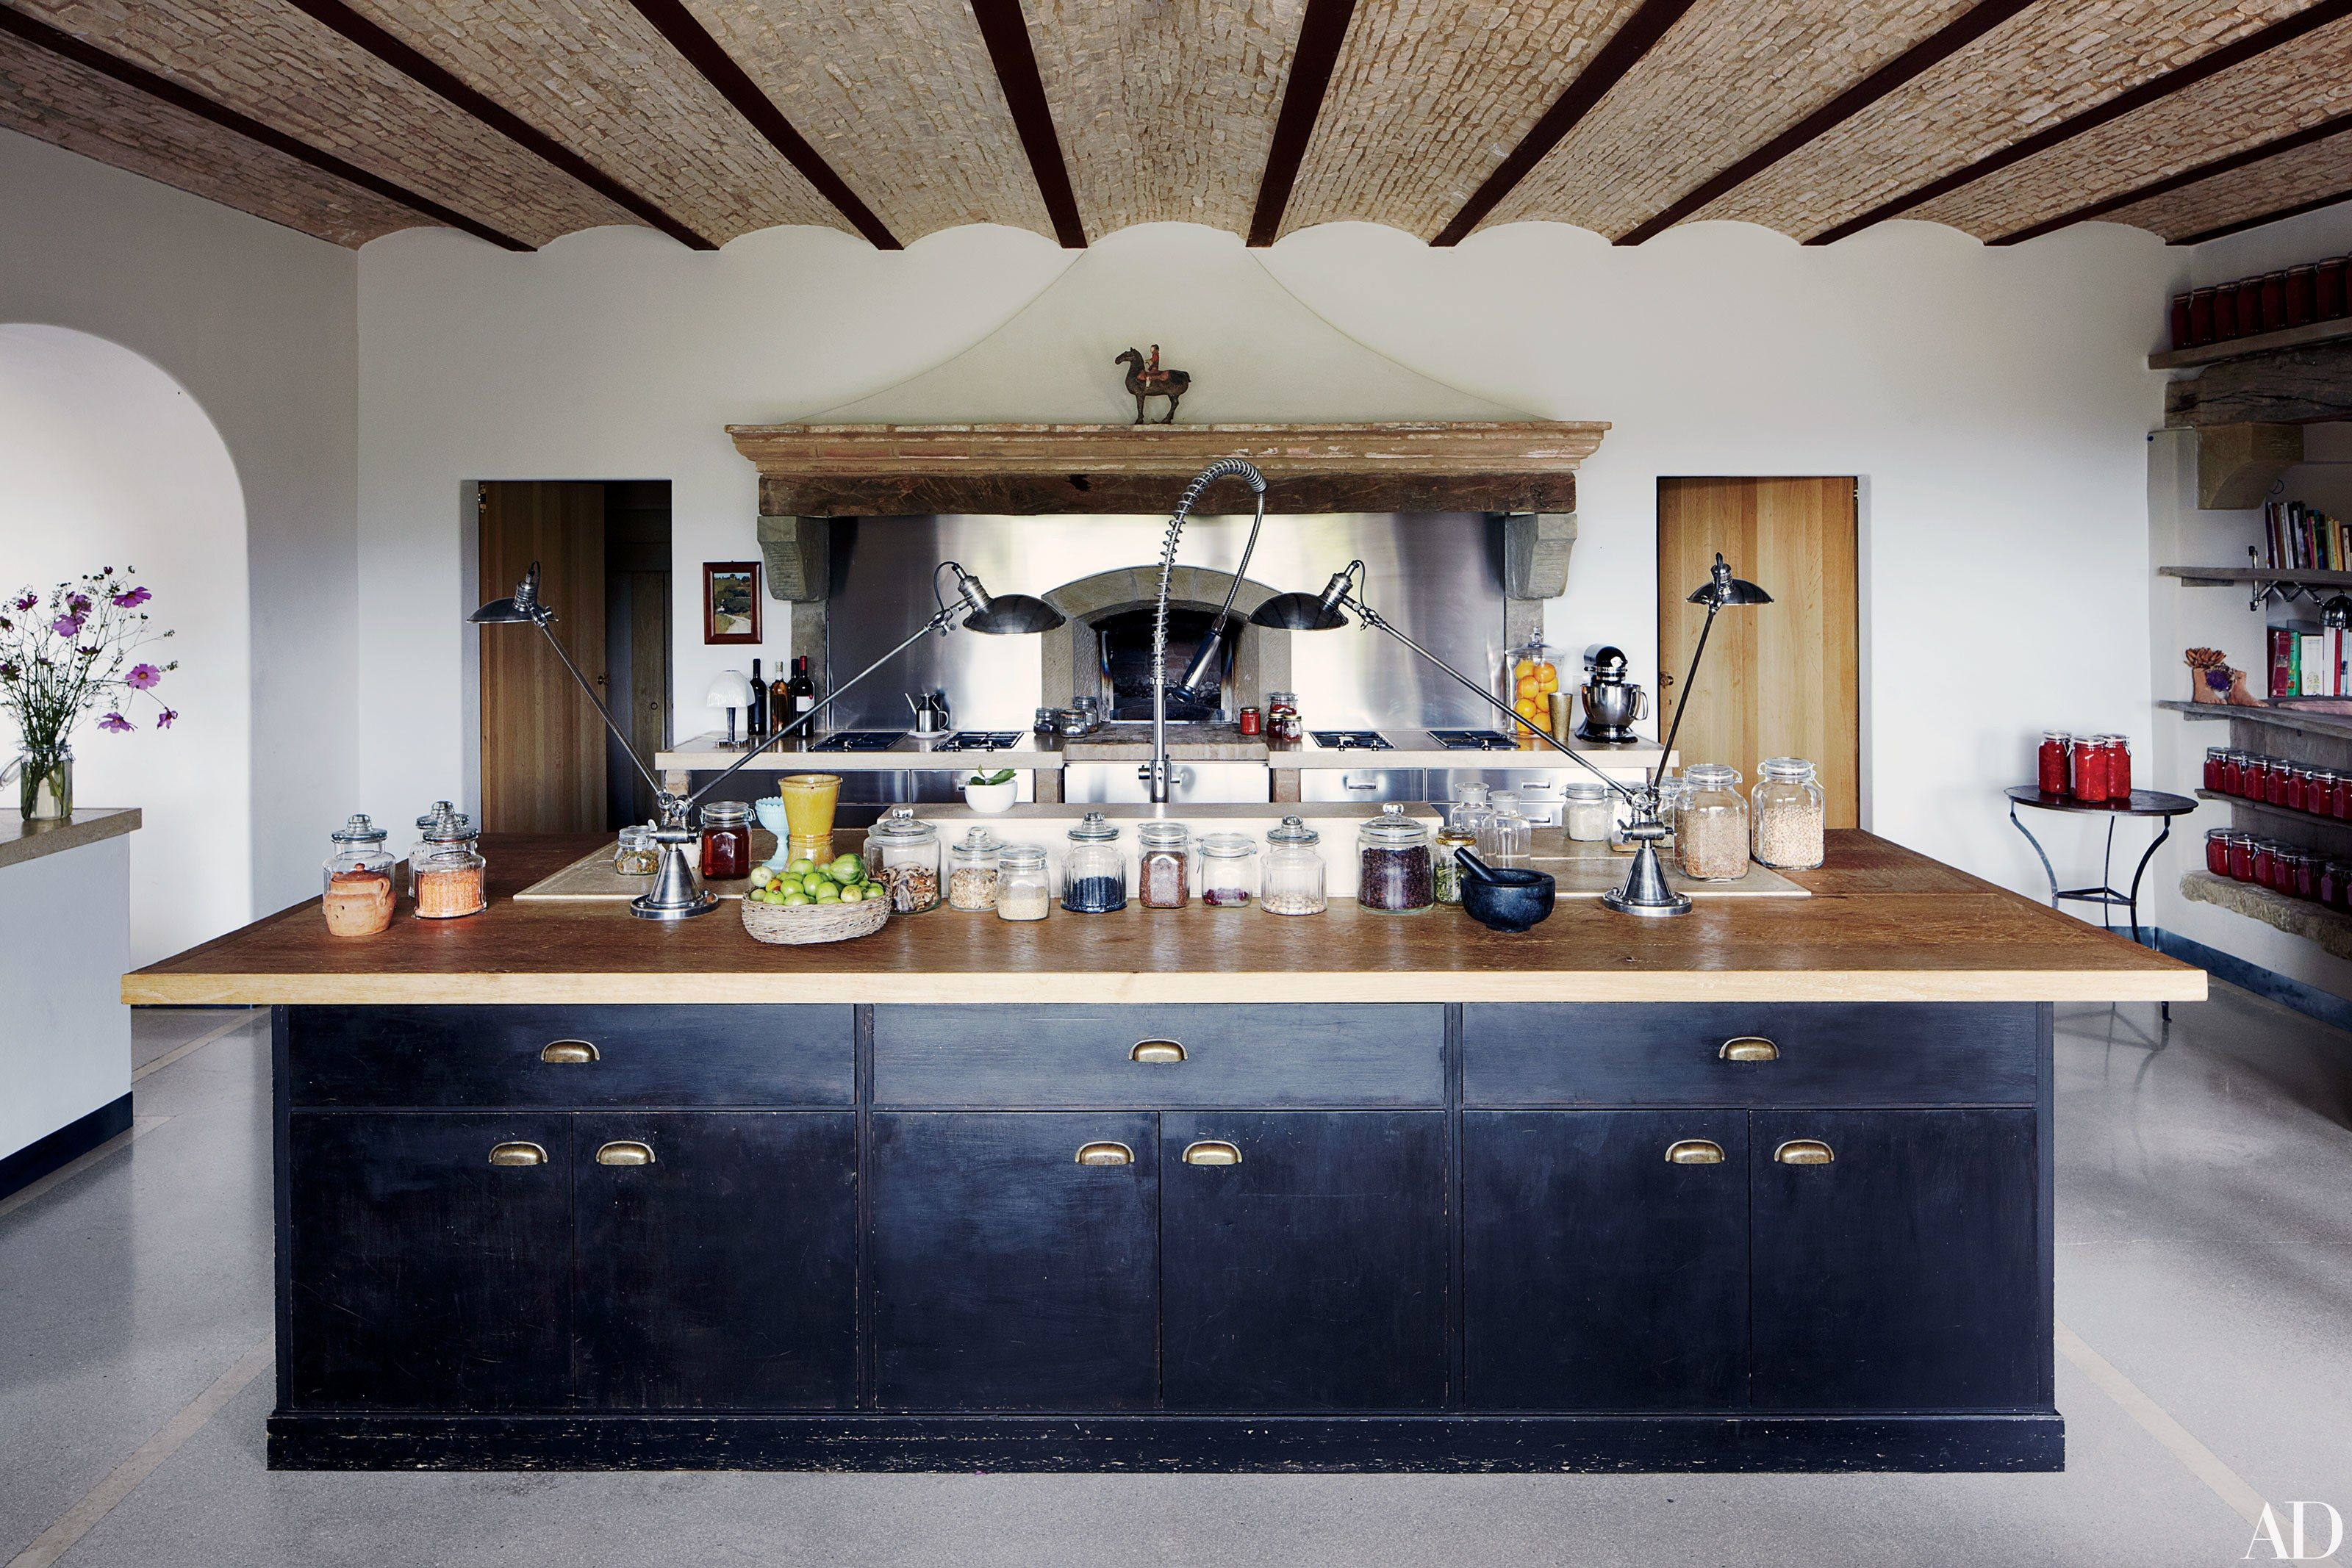 Image Result For Stunning Kitchen Islands  Goldenbackstudioiql Stunning Kitchen Islands Design Decoration